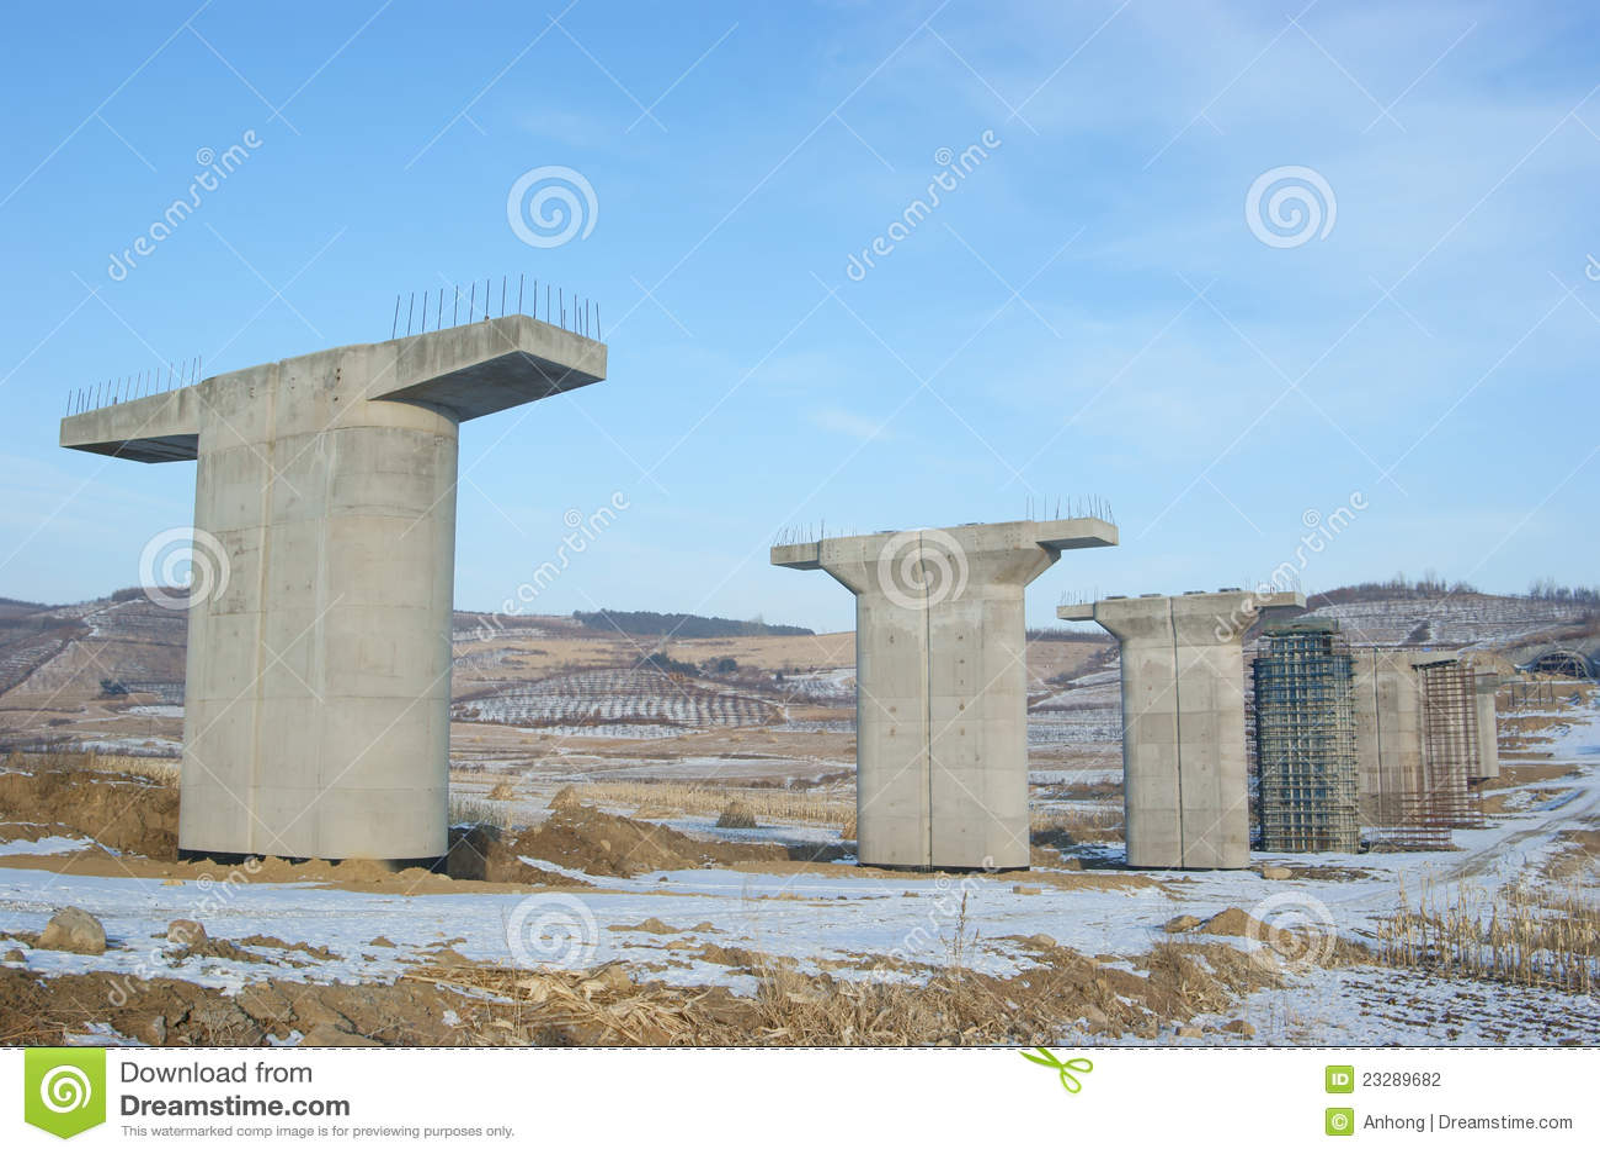 Concrete piers stock photography image 23289682 for Building a house on concrete piers